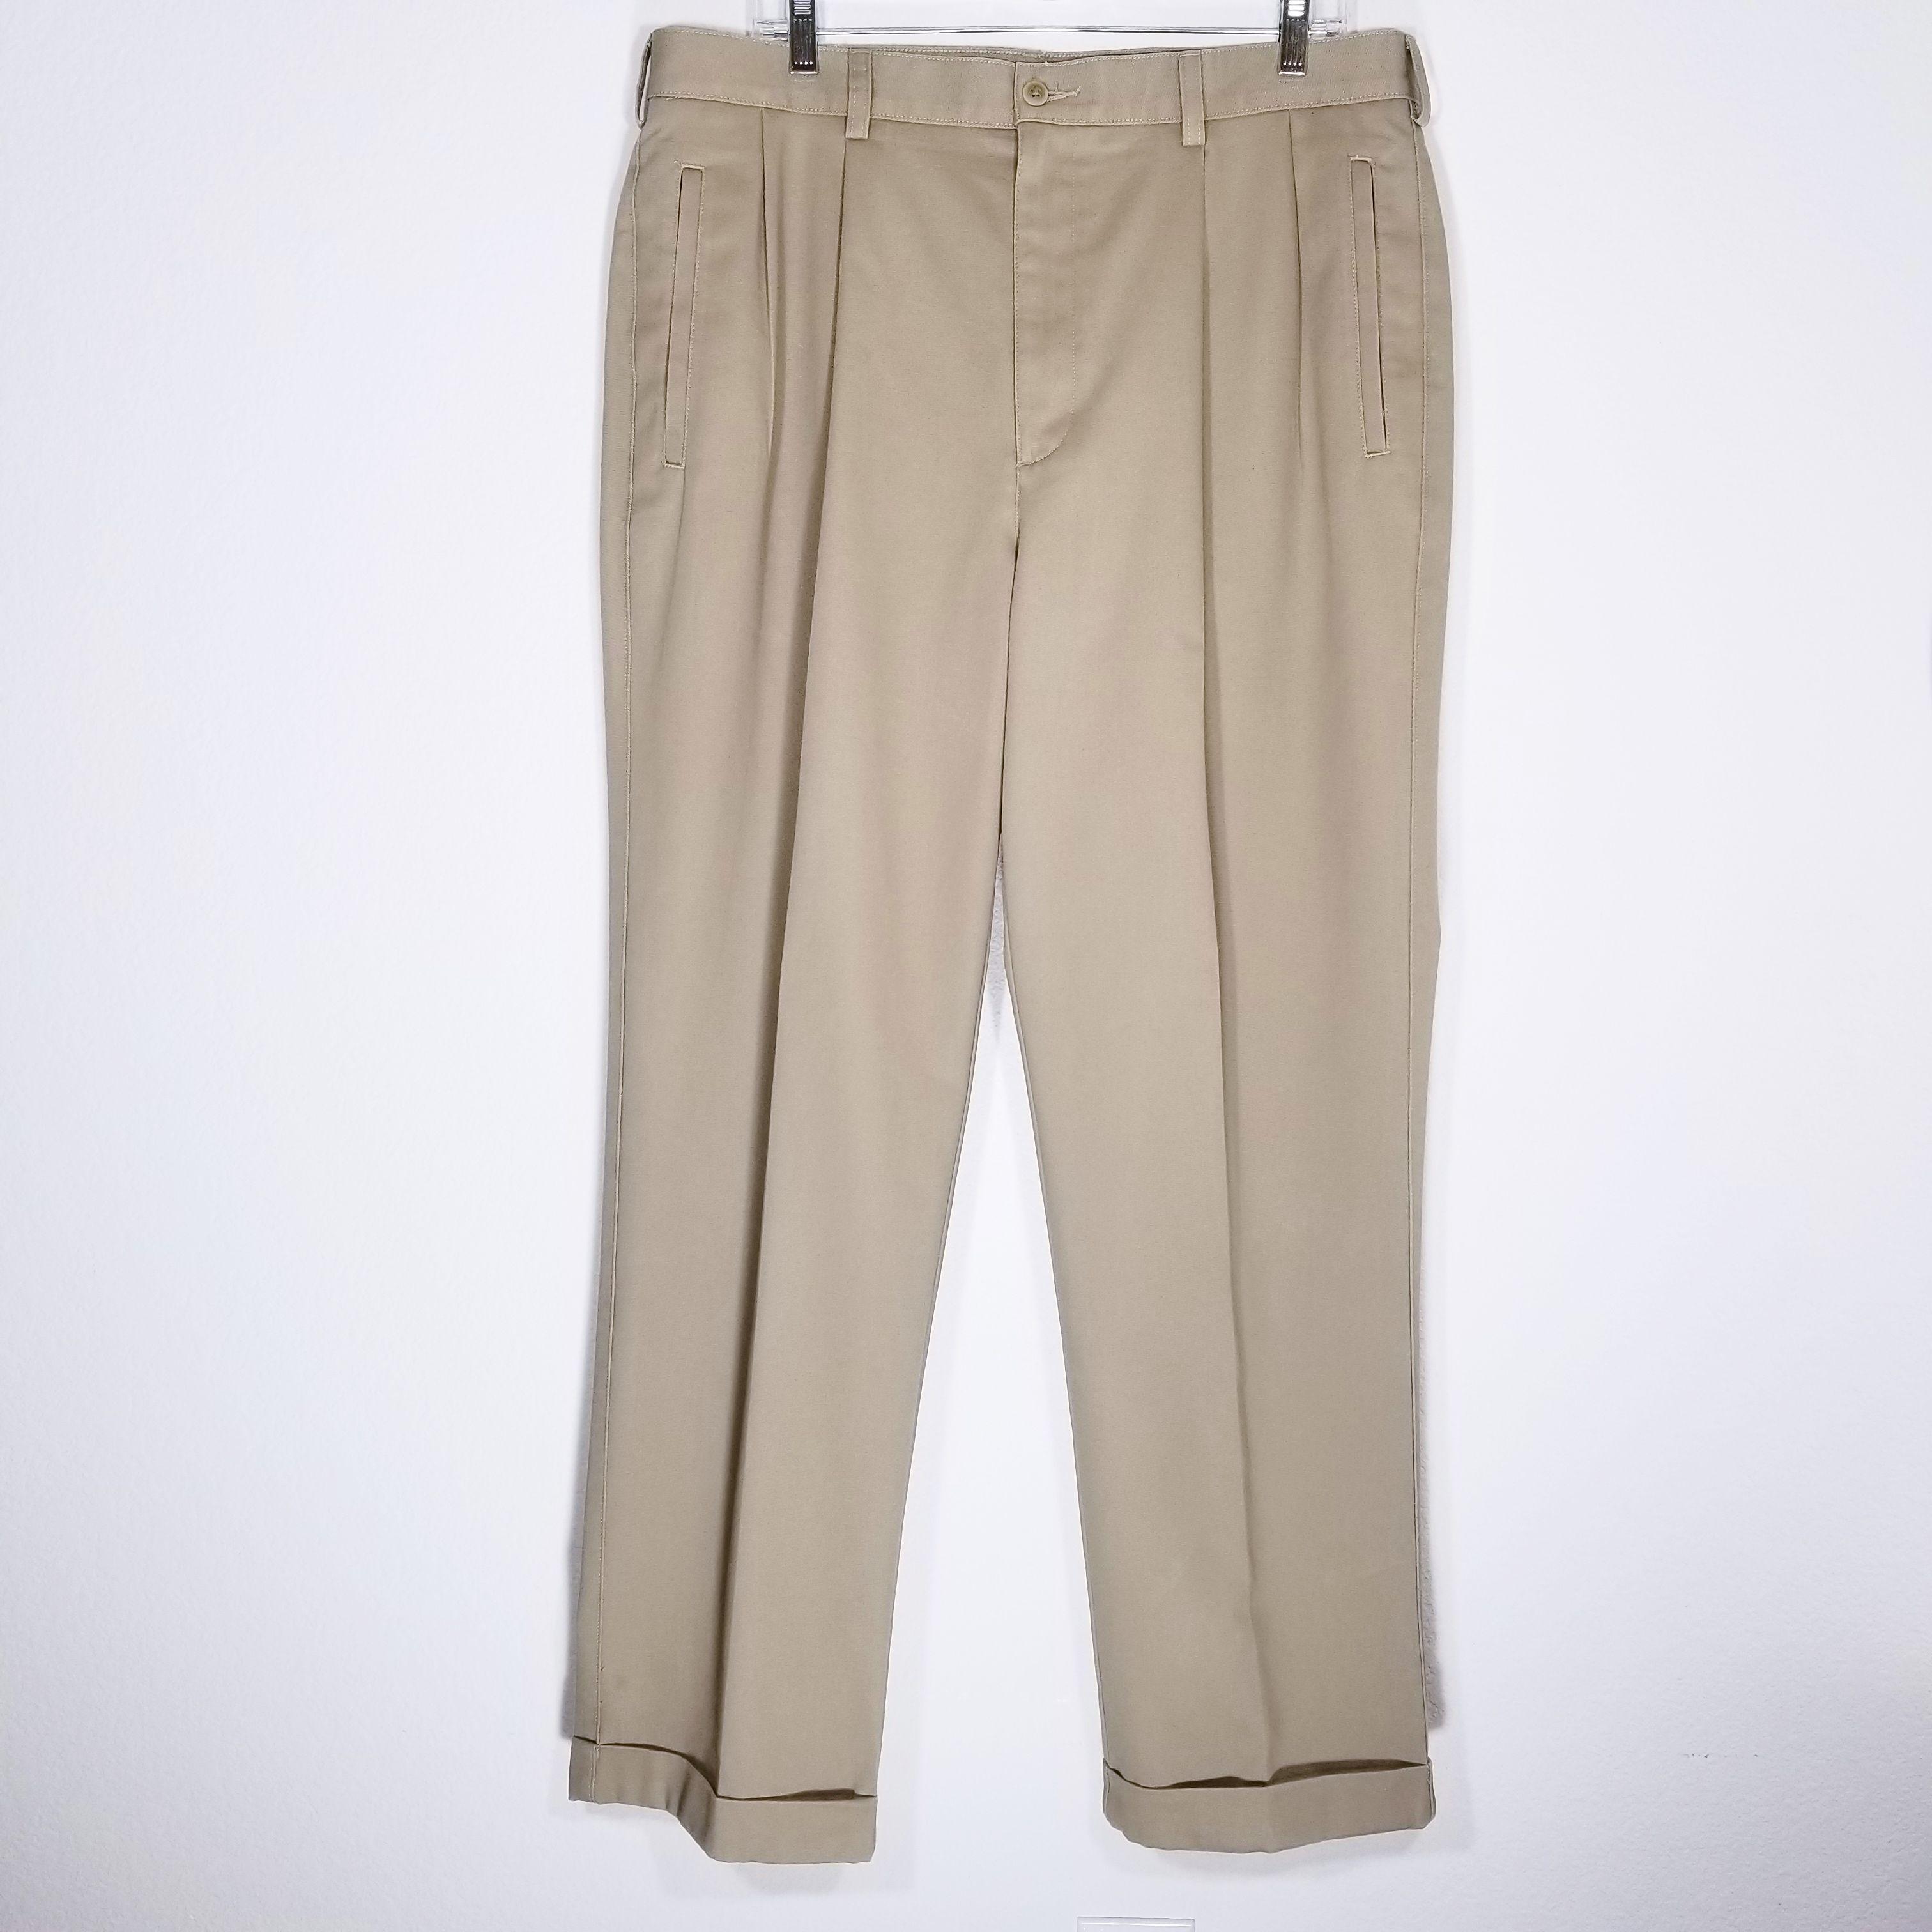 CABELA'S Men's Khaki Dress Pants Size 36x32 Beige Pleated